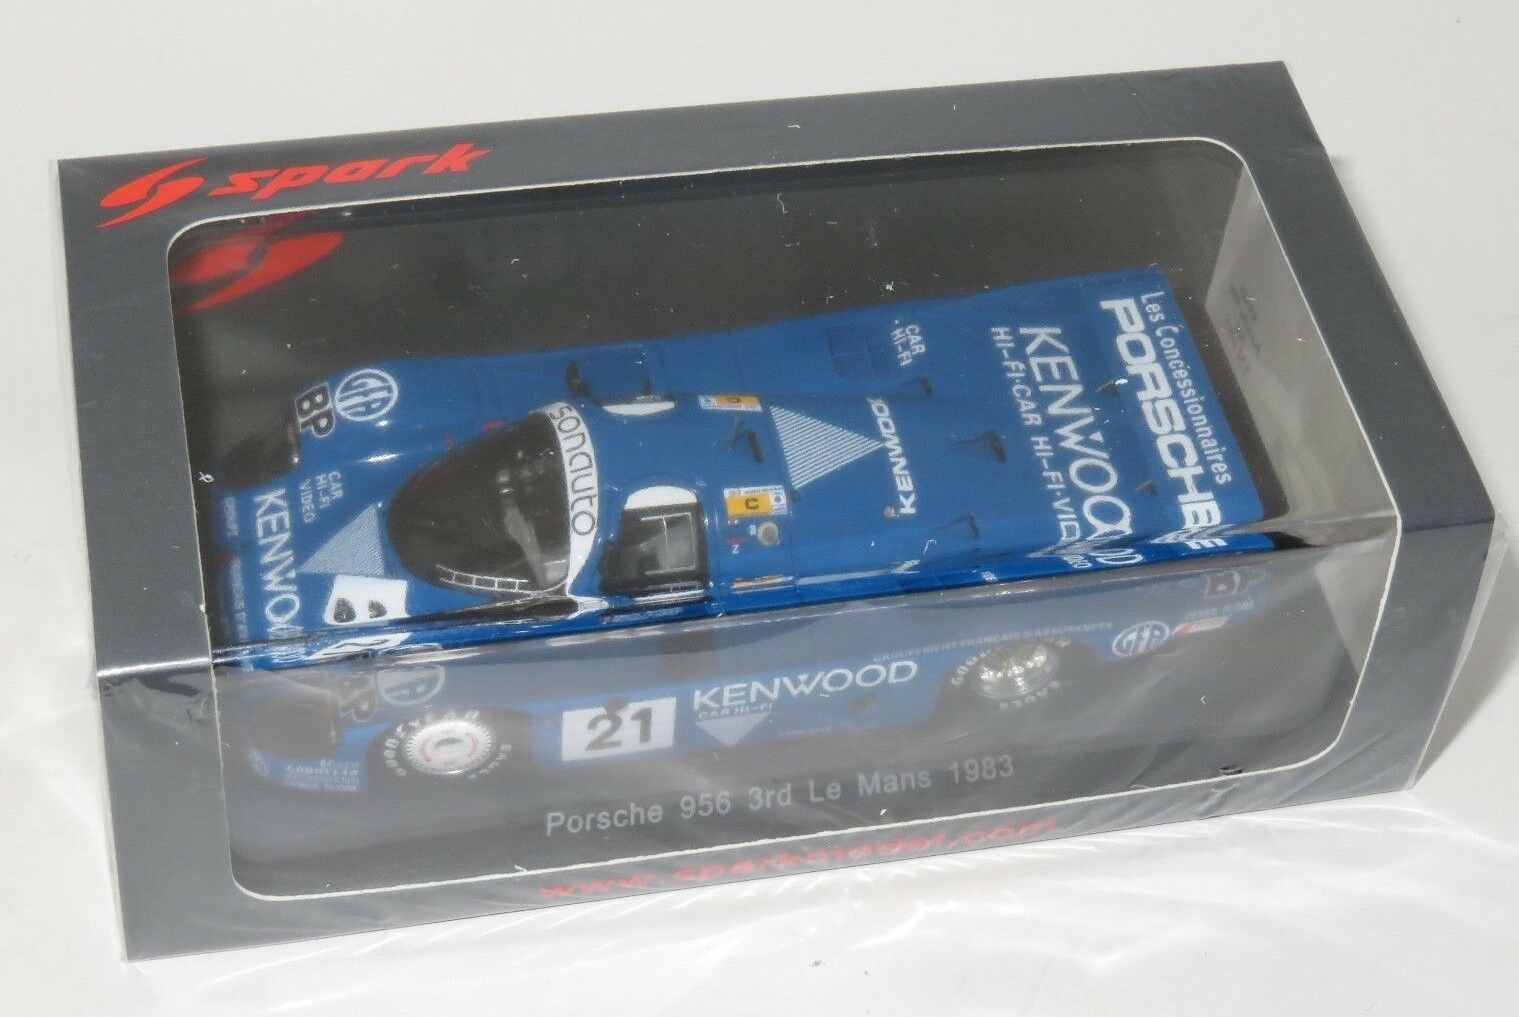 1/43 Porsche 956 Kenwood Porsche Kramer Racing Le Mans 24 horas 2018 21